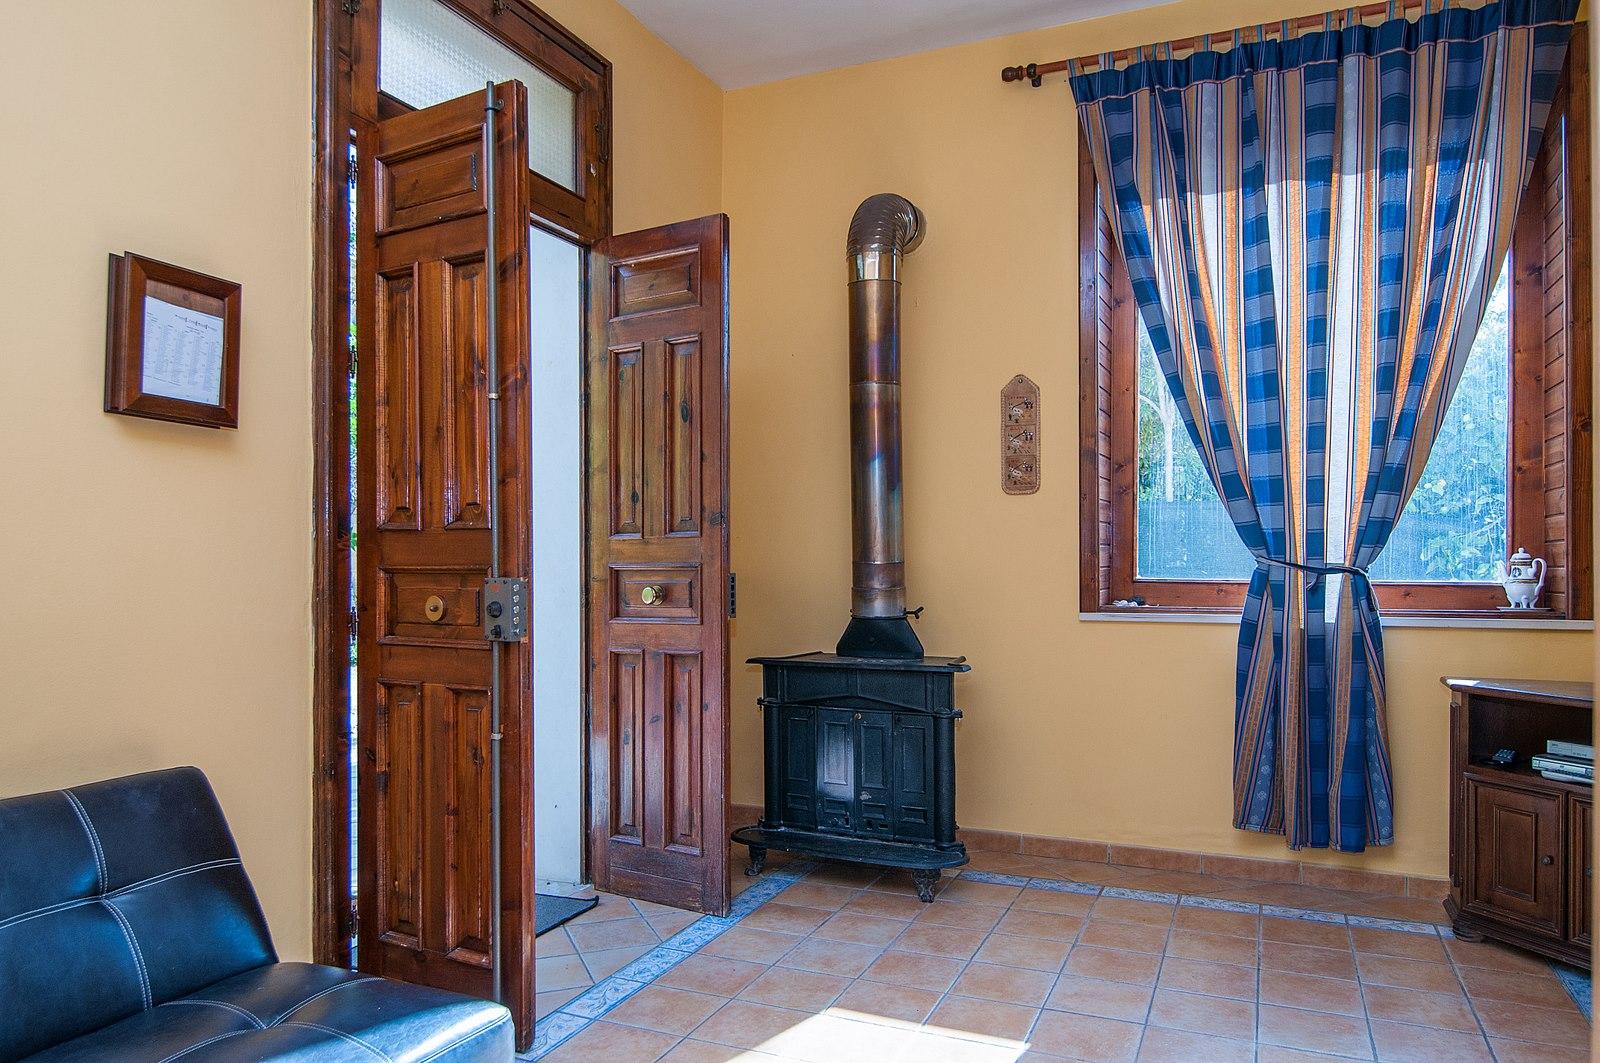 Maison de vacances Villetta a Lido (1540086), Lido di Noto, Siracusa, Sicile, Italie, image 18